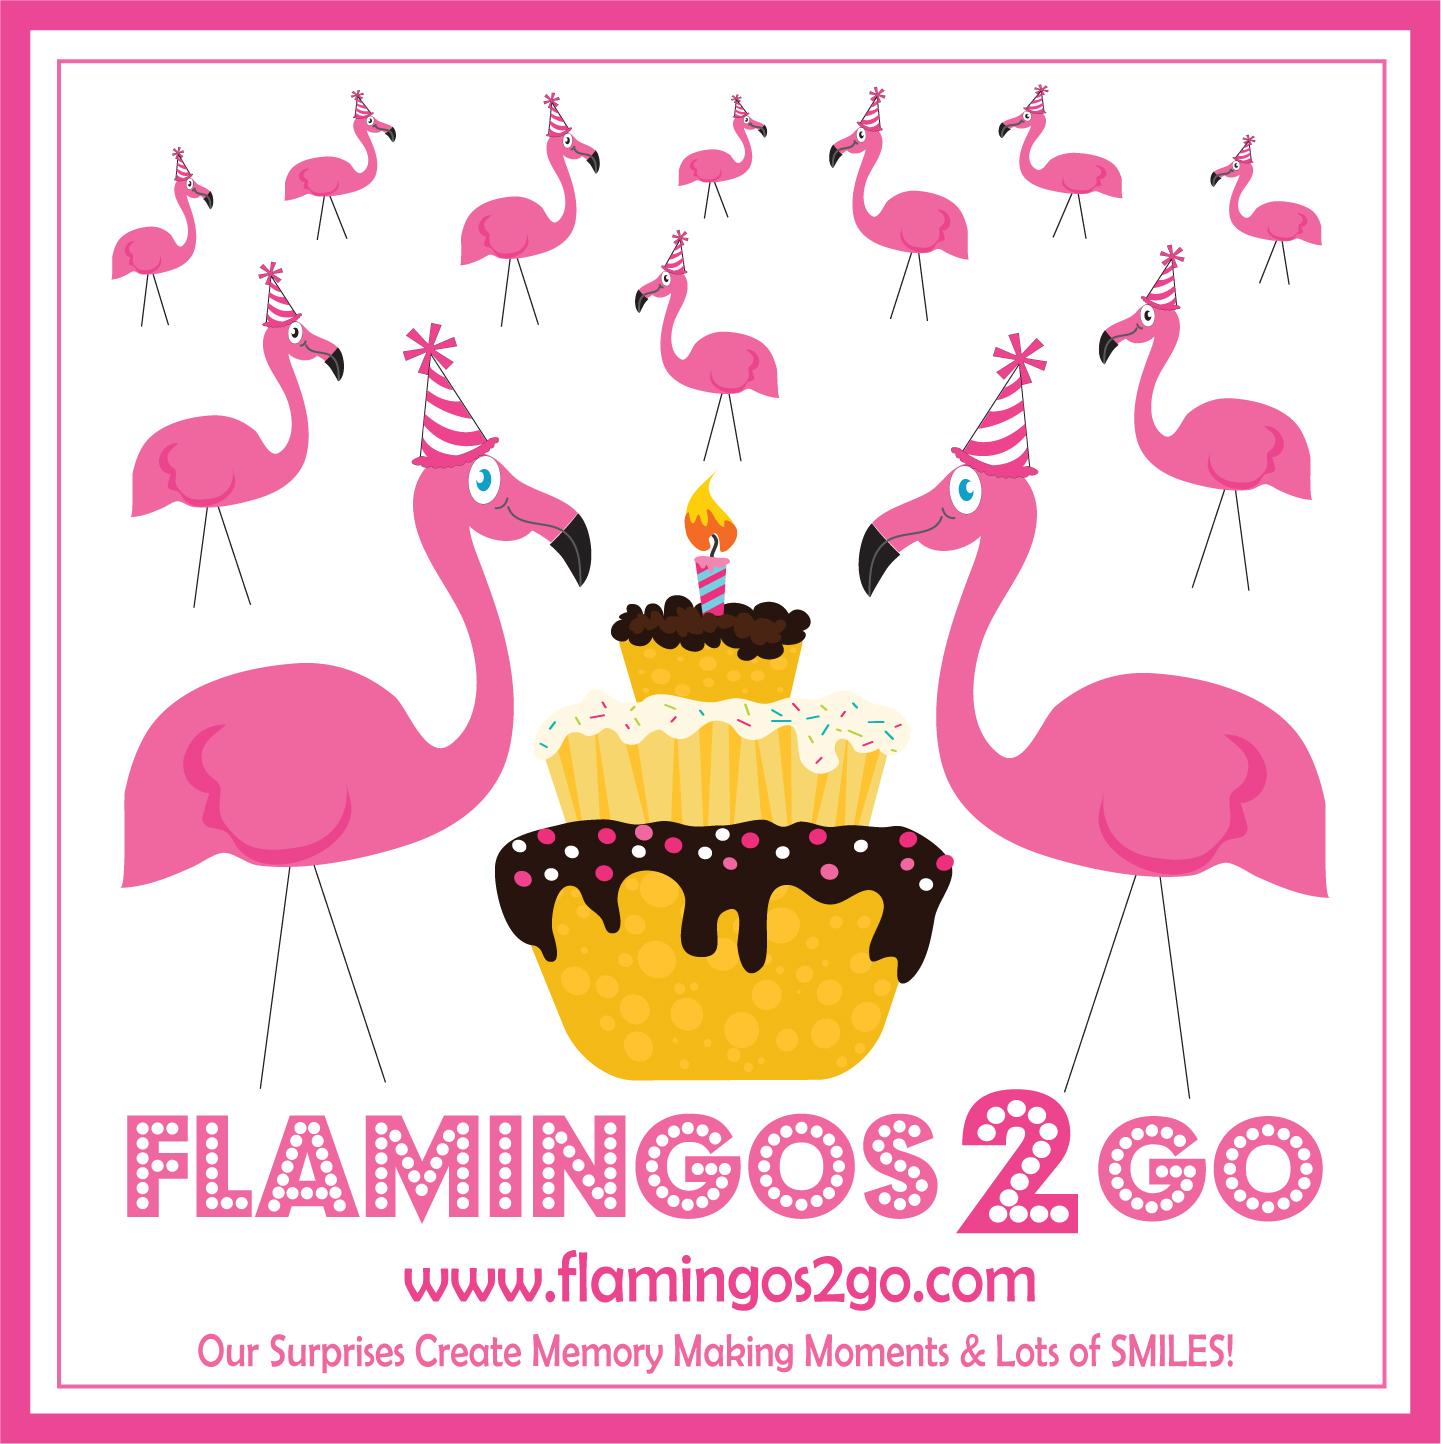 Business Opportunity Flamingos 2 Go